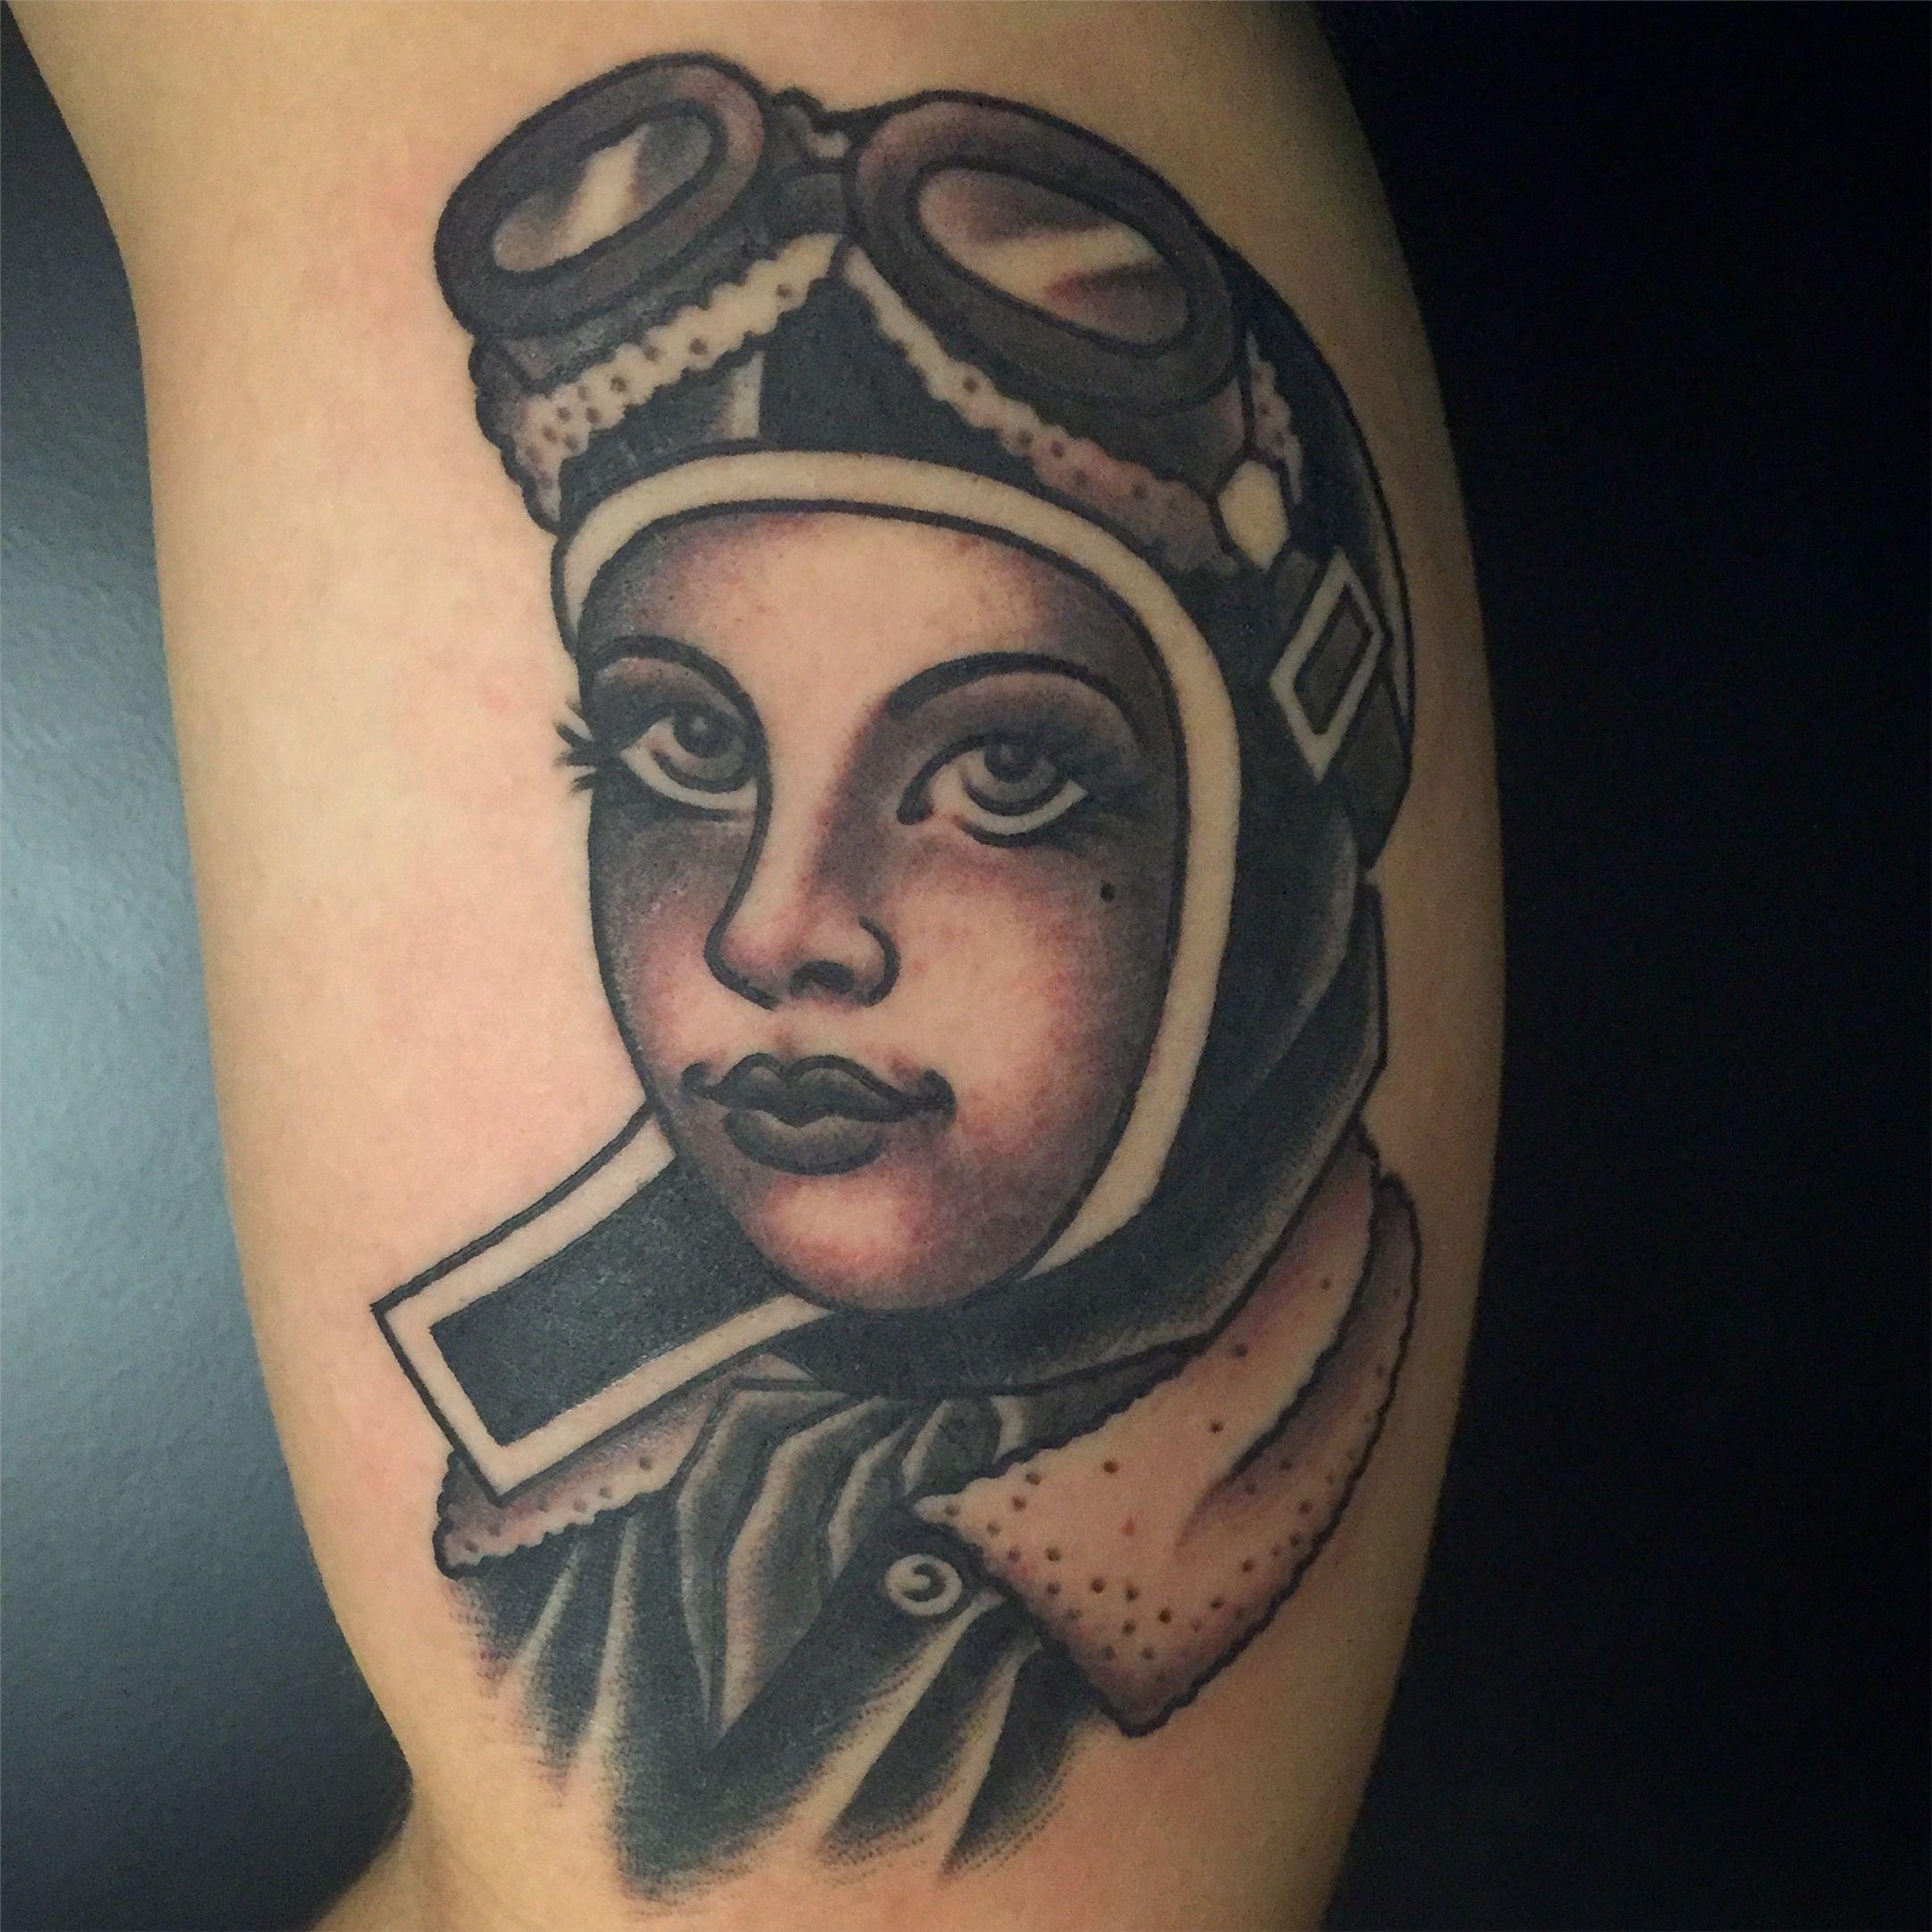 By Brandon Kemp Aces Tattoos Denton Tx Instagram Brandonkemptattoo Ace Tattoo Denton Kemp